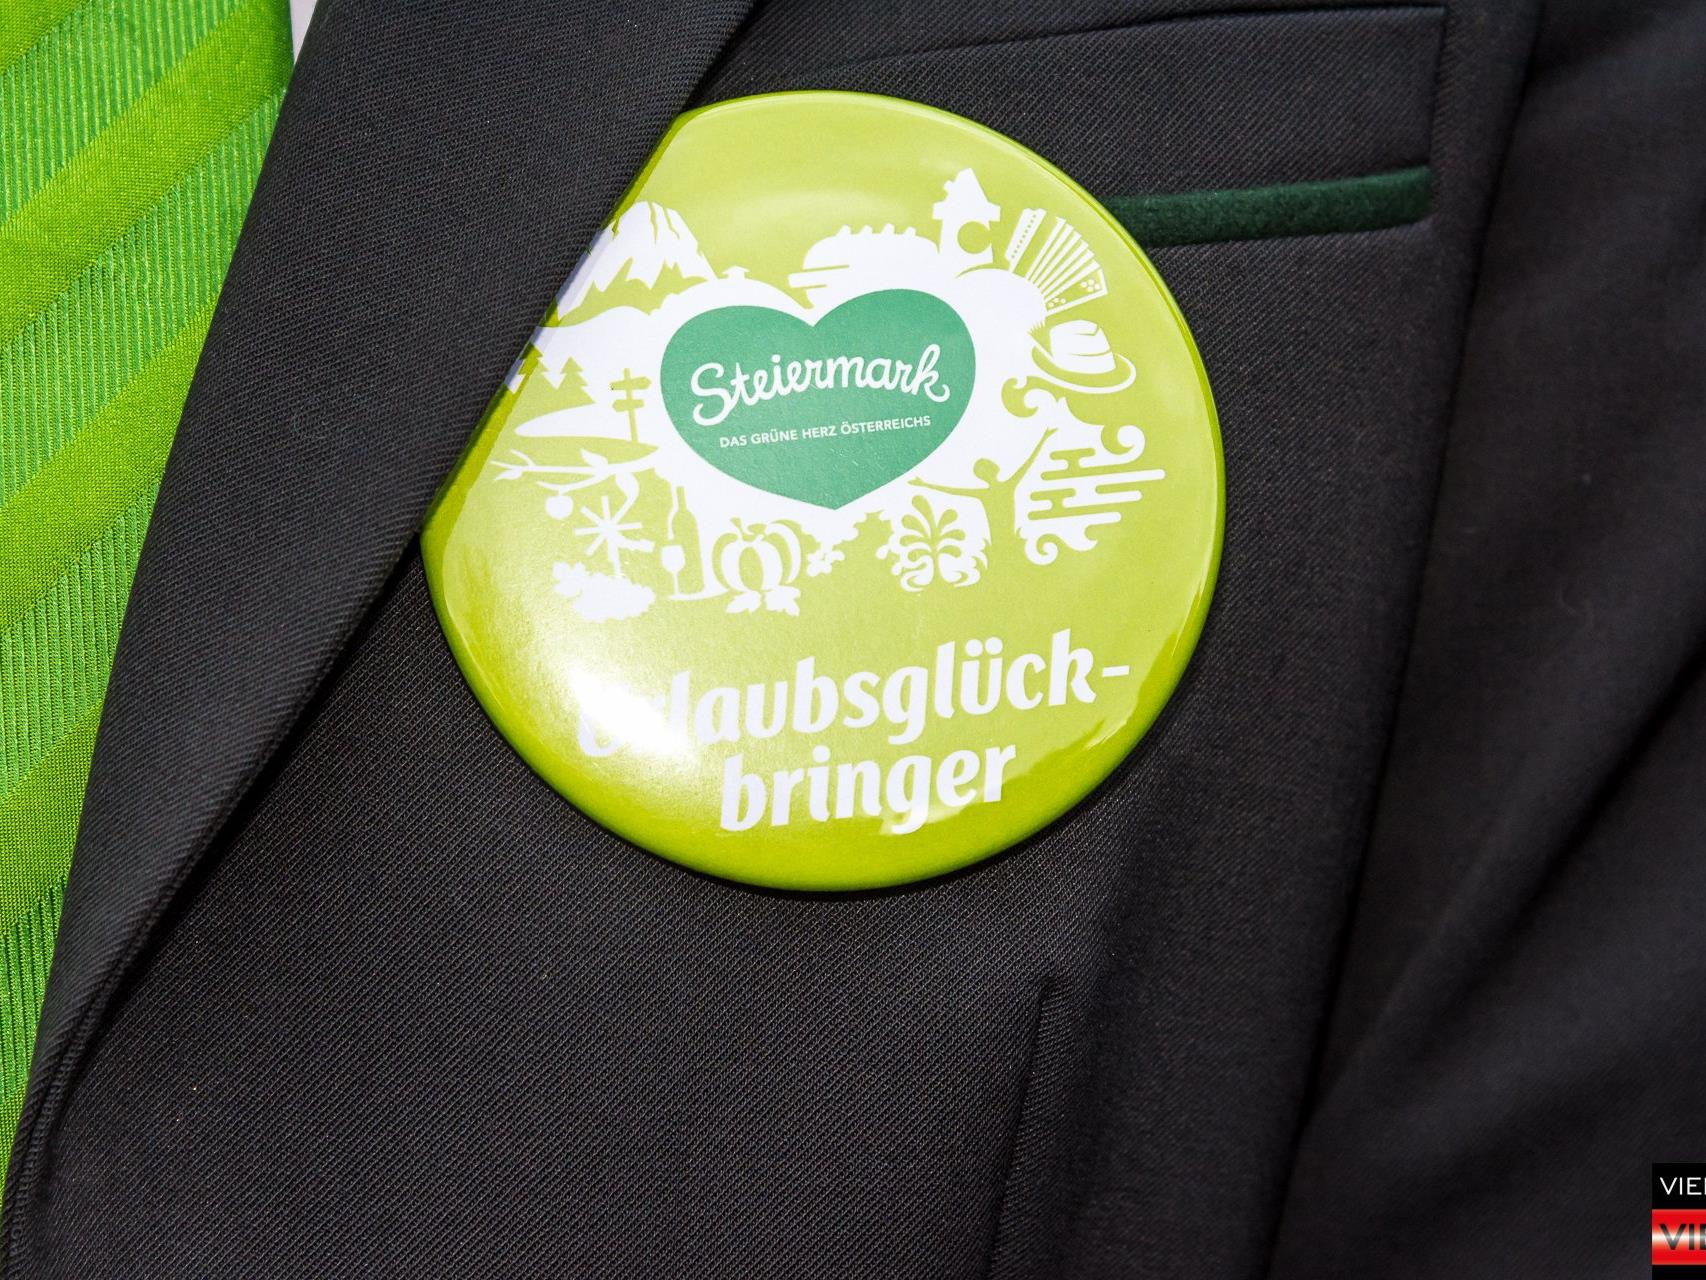 Eröffnung 21. Steiermark-Frühling am Wiener Rathausplatz - Steiermarkdorf am Wiener Rathausplatz - 06.09.2017